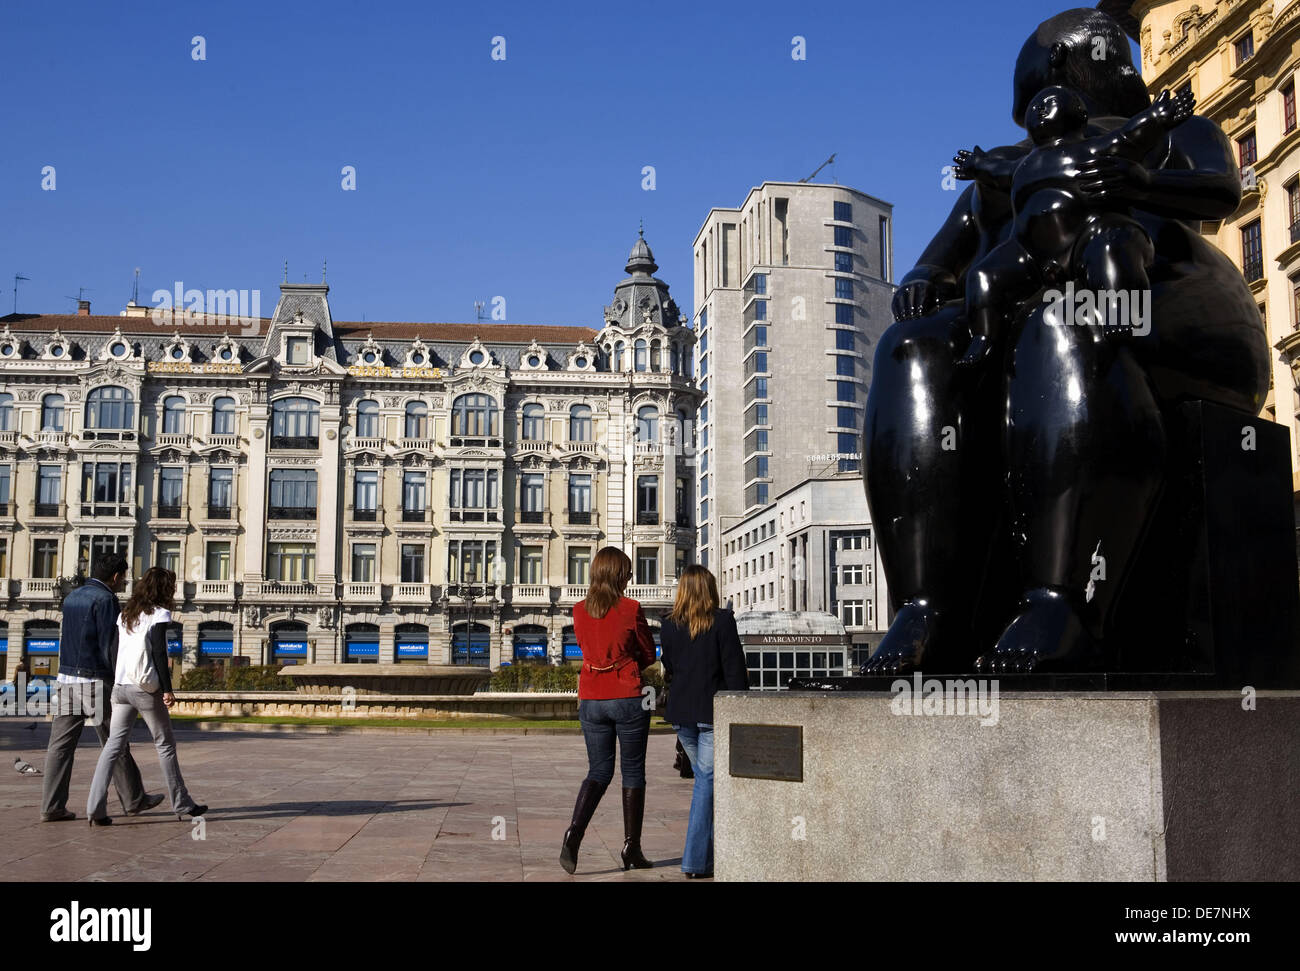 Spain. Asturias. Oviedo. Maternity statue in Escandalera Square. - Stock Image